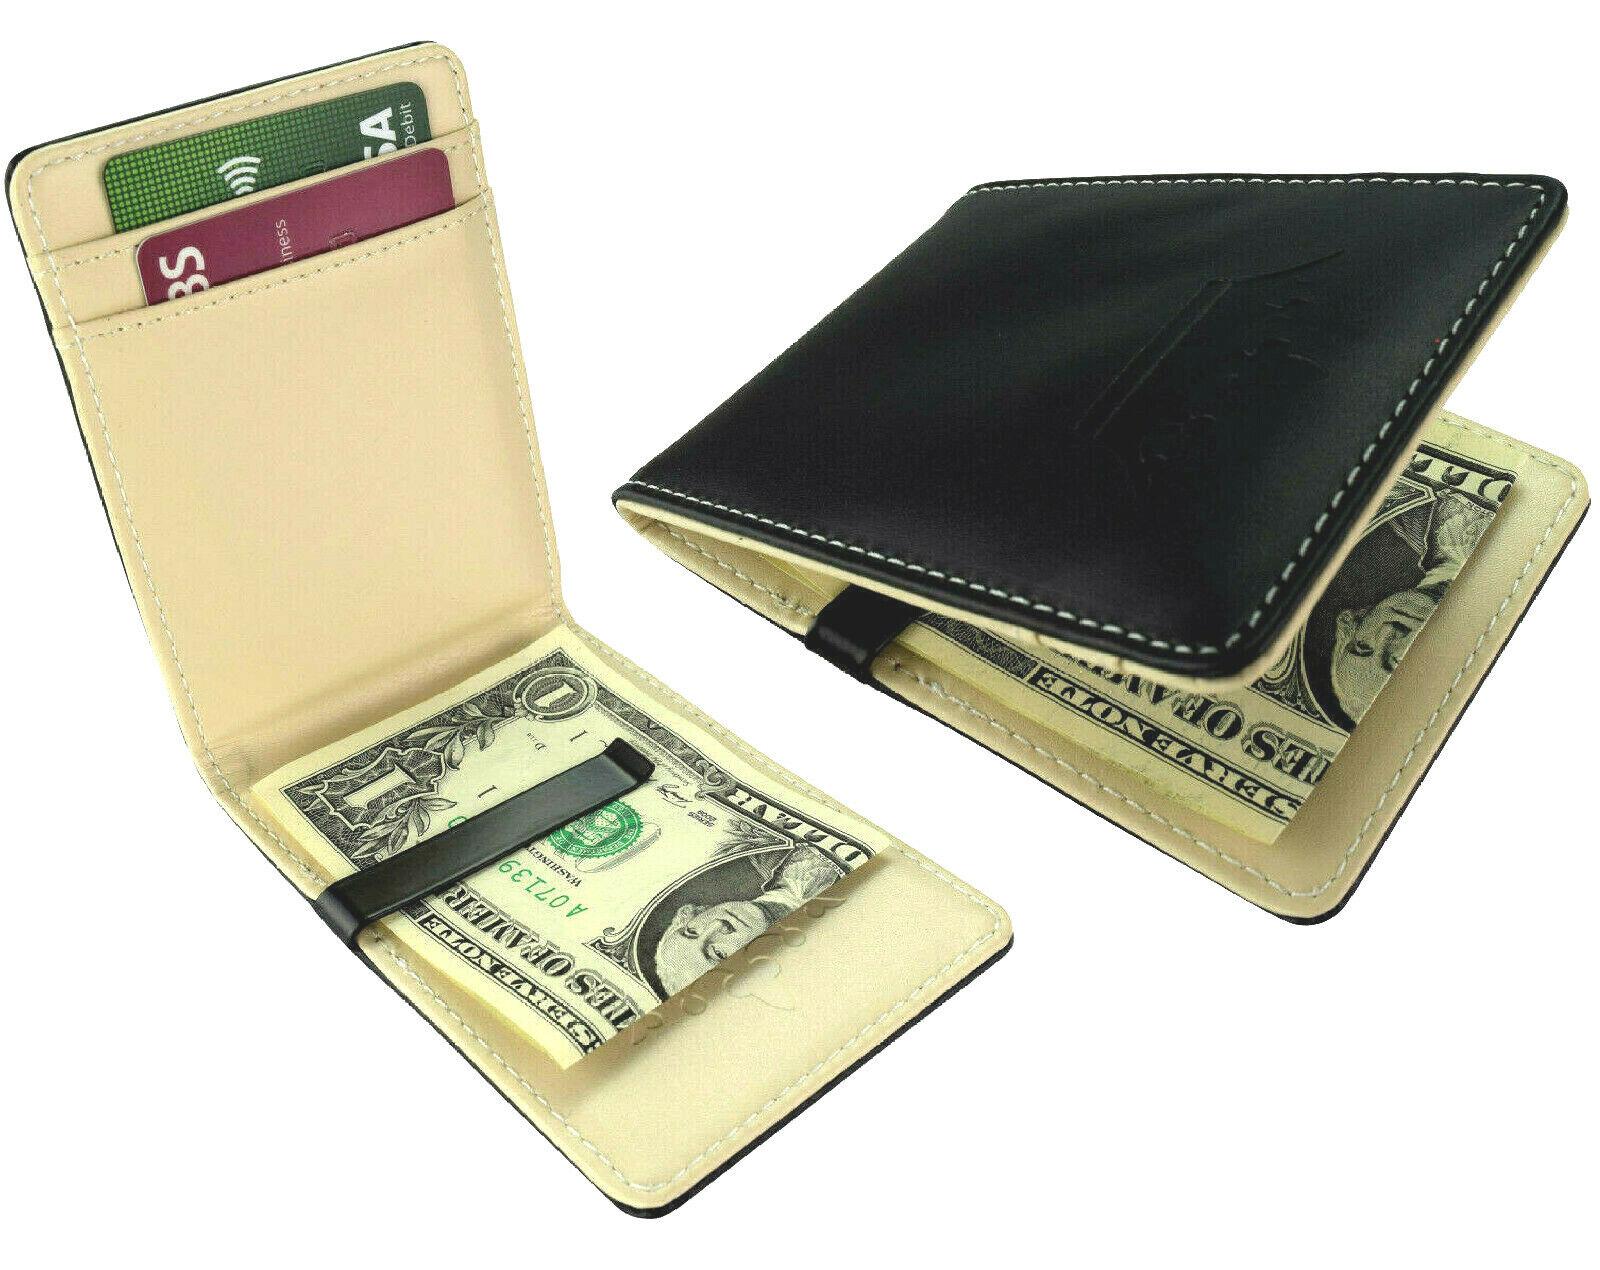 NEW Black Steel Clip UK Wallet Faux Leather Money Bifold ID Card Slots Holder